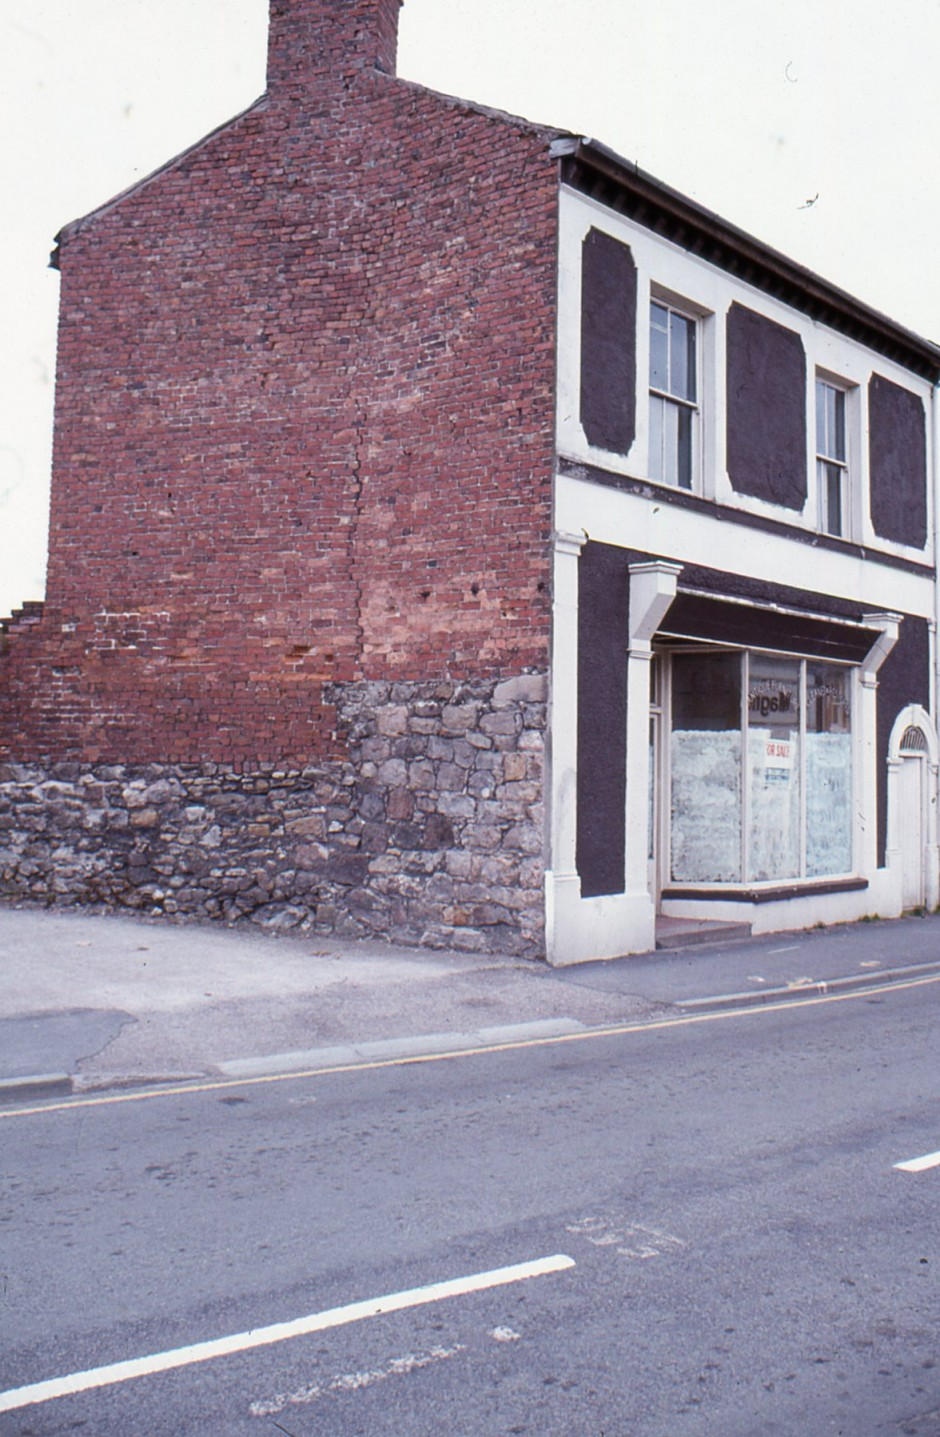 SL-O-5-57-3 Oswestry - Welsh Walls